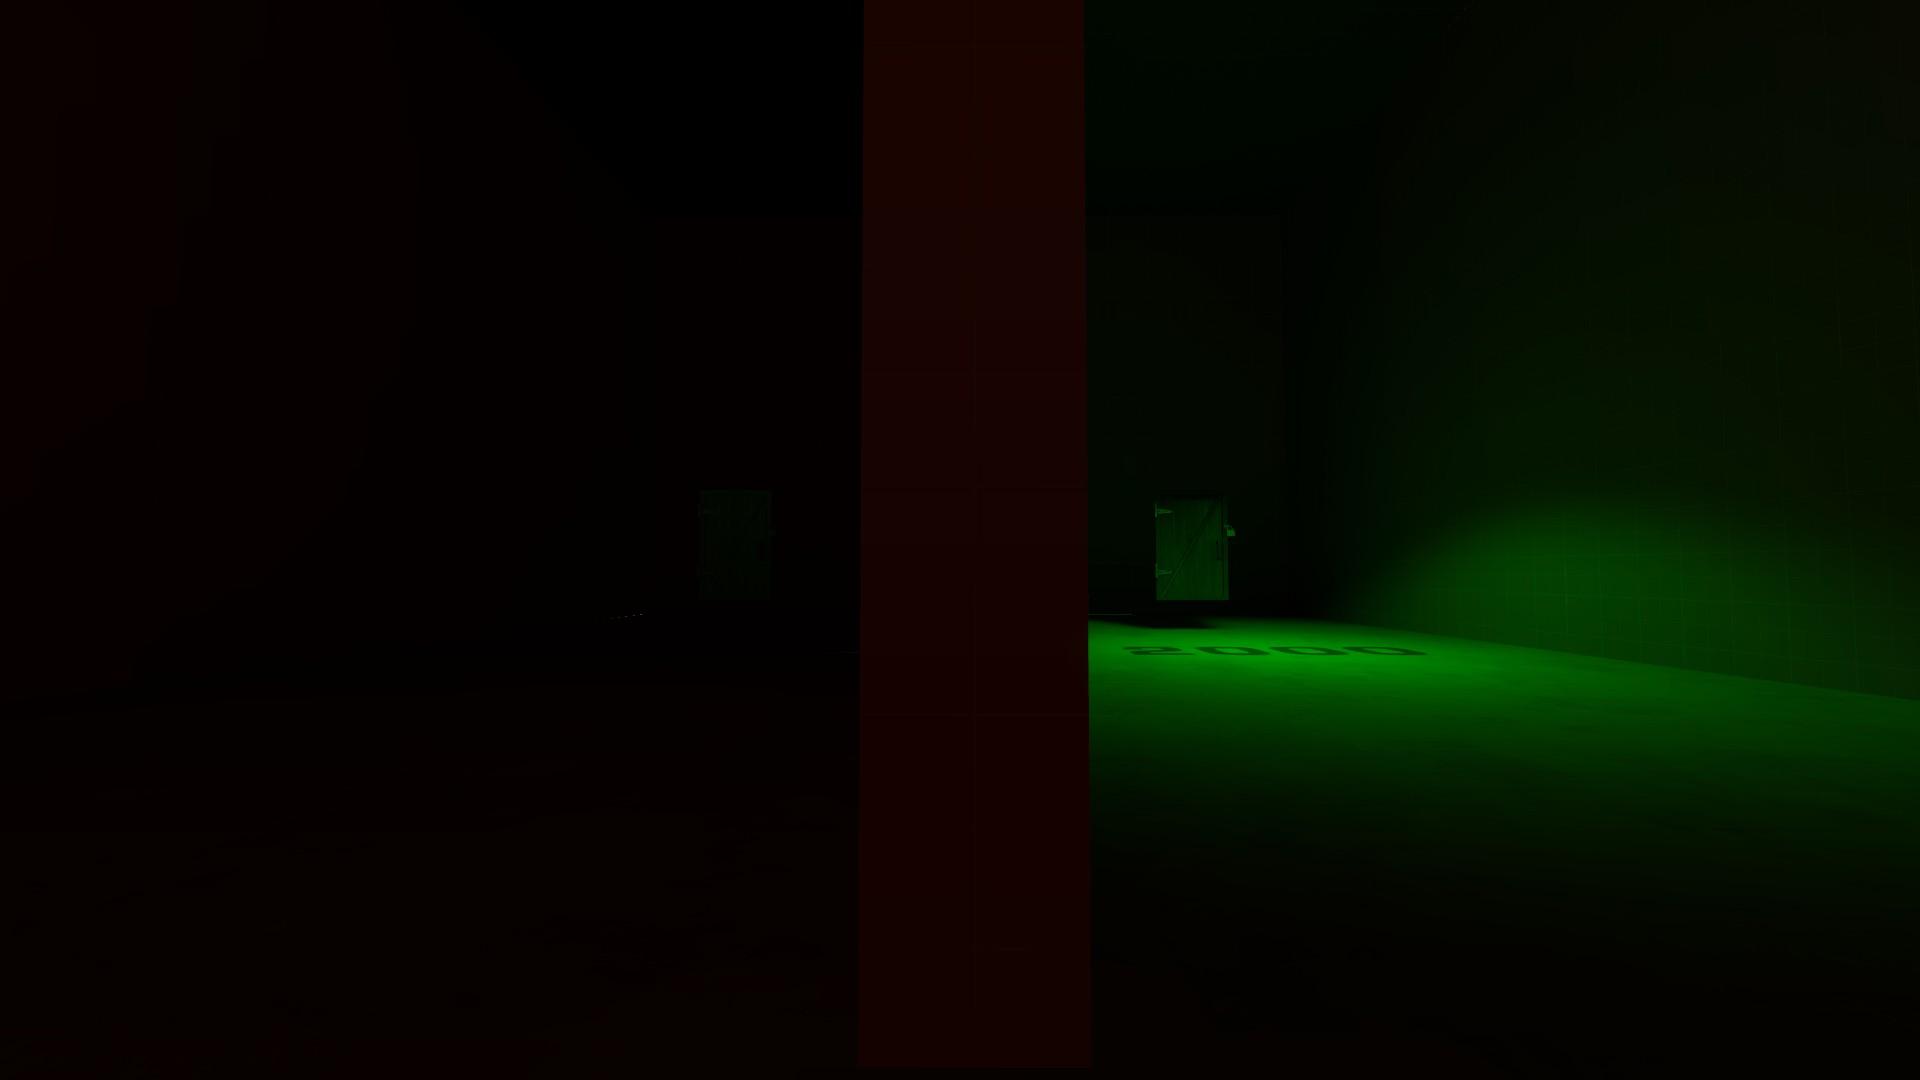 light_spot_2000.jpg